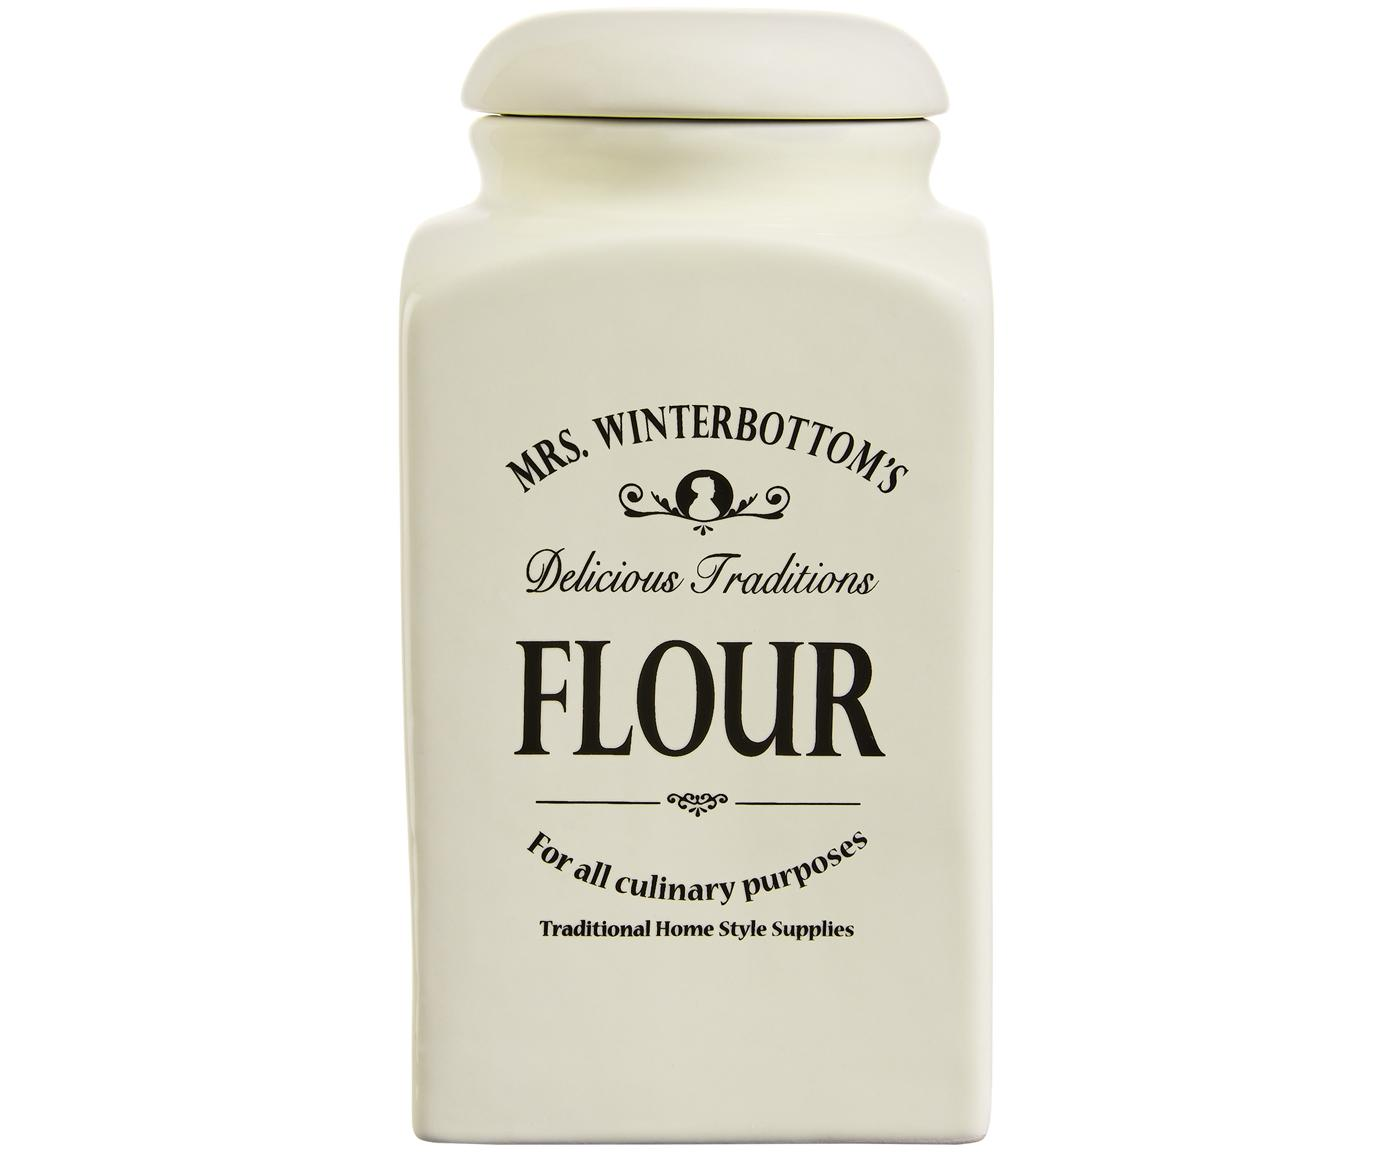 Contenitore Mrs Winterbottoms Flour, Terracotta, Crema, nero, Ø 11 x Alt. 21 cm